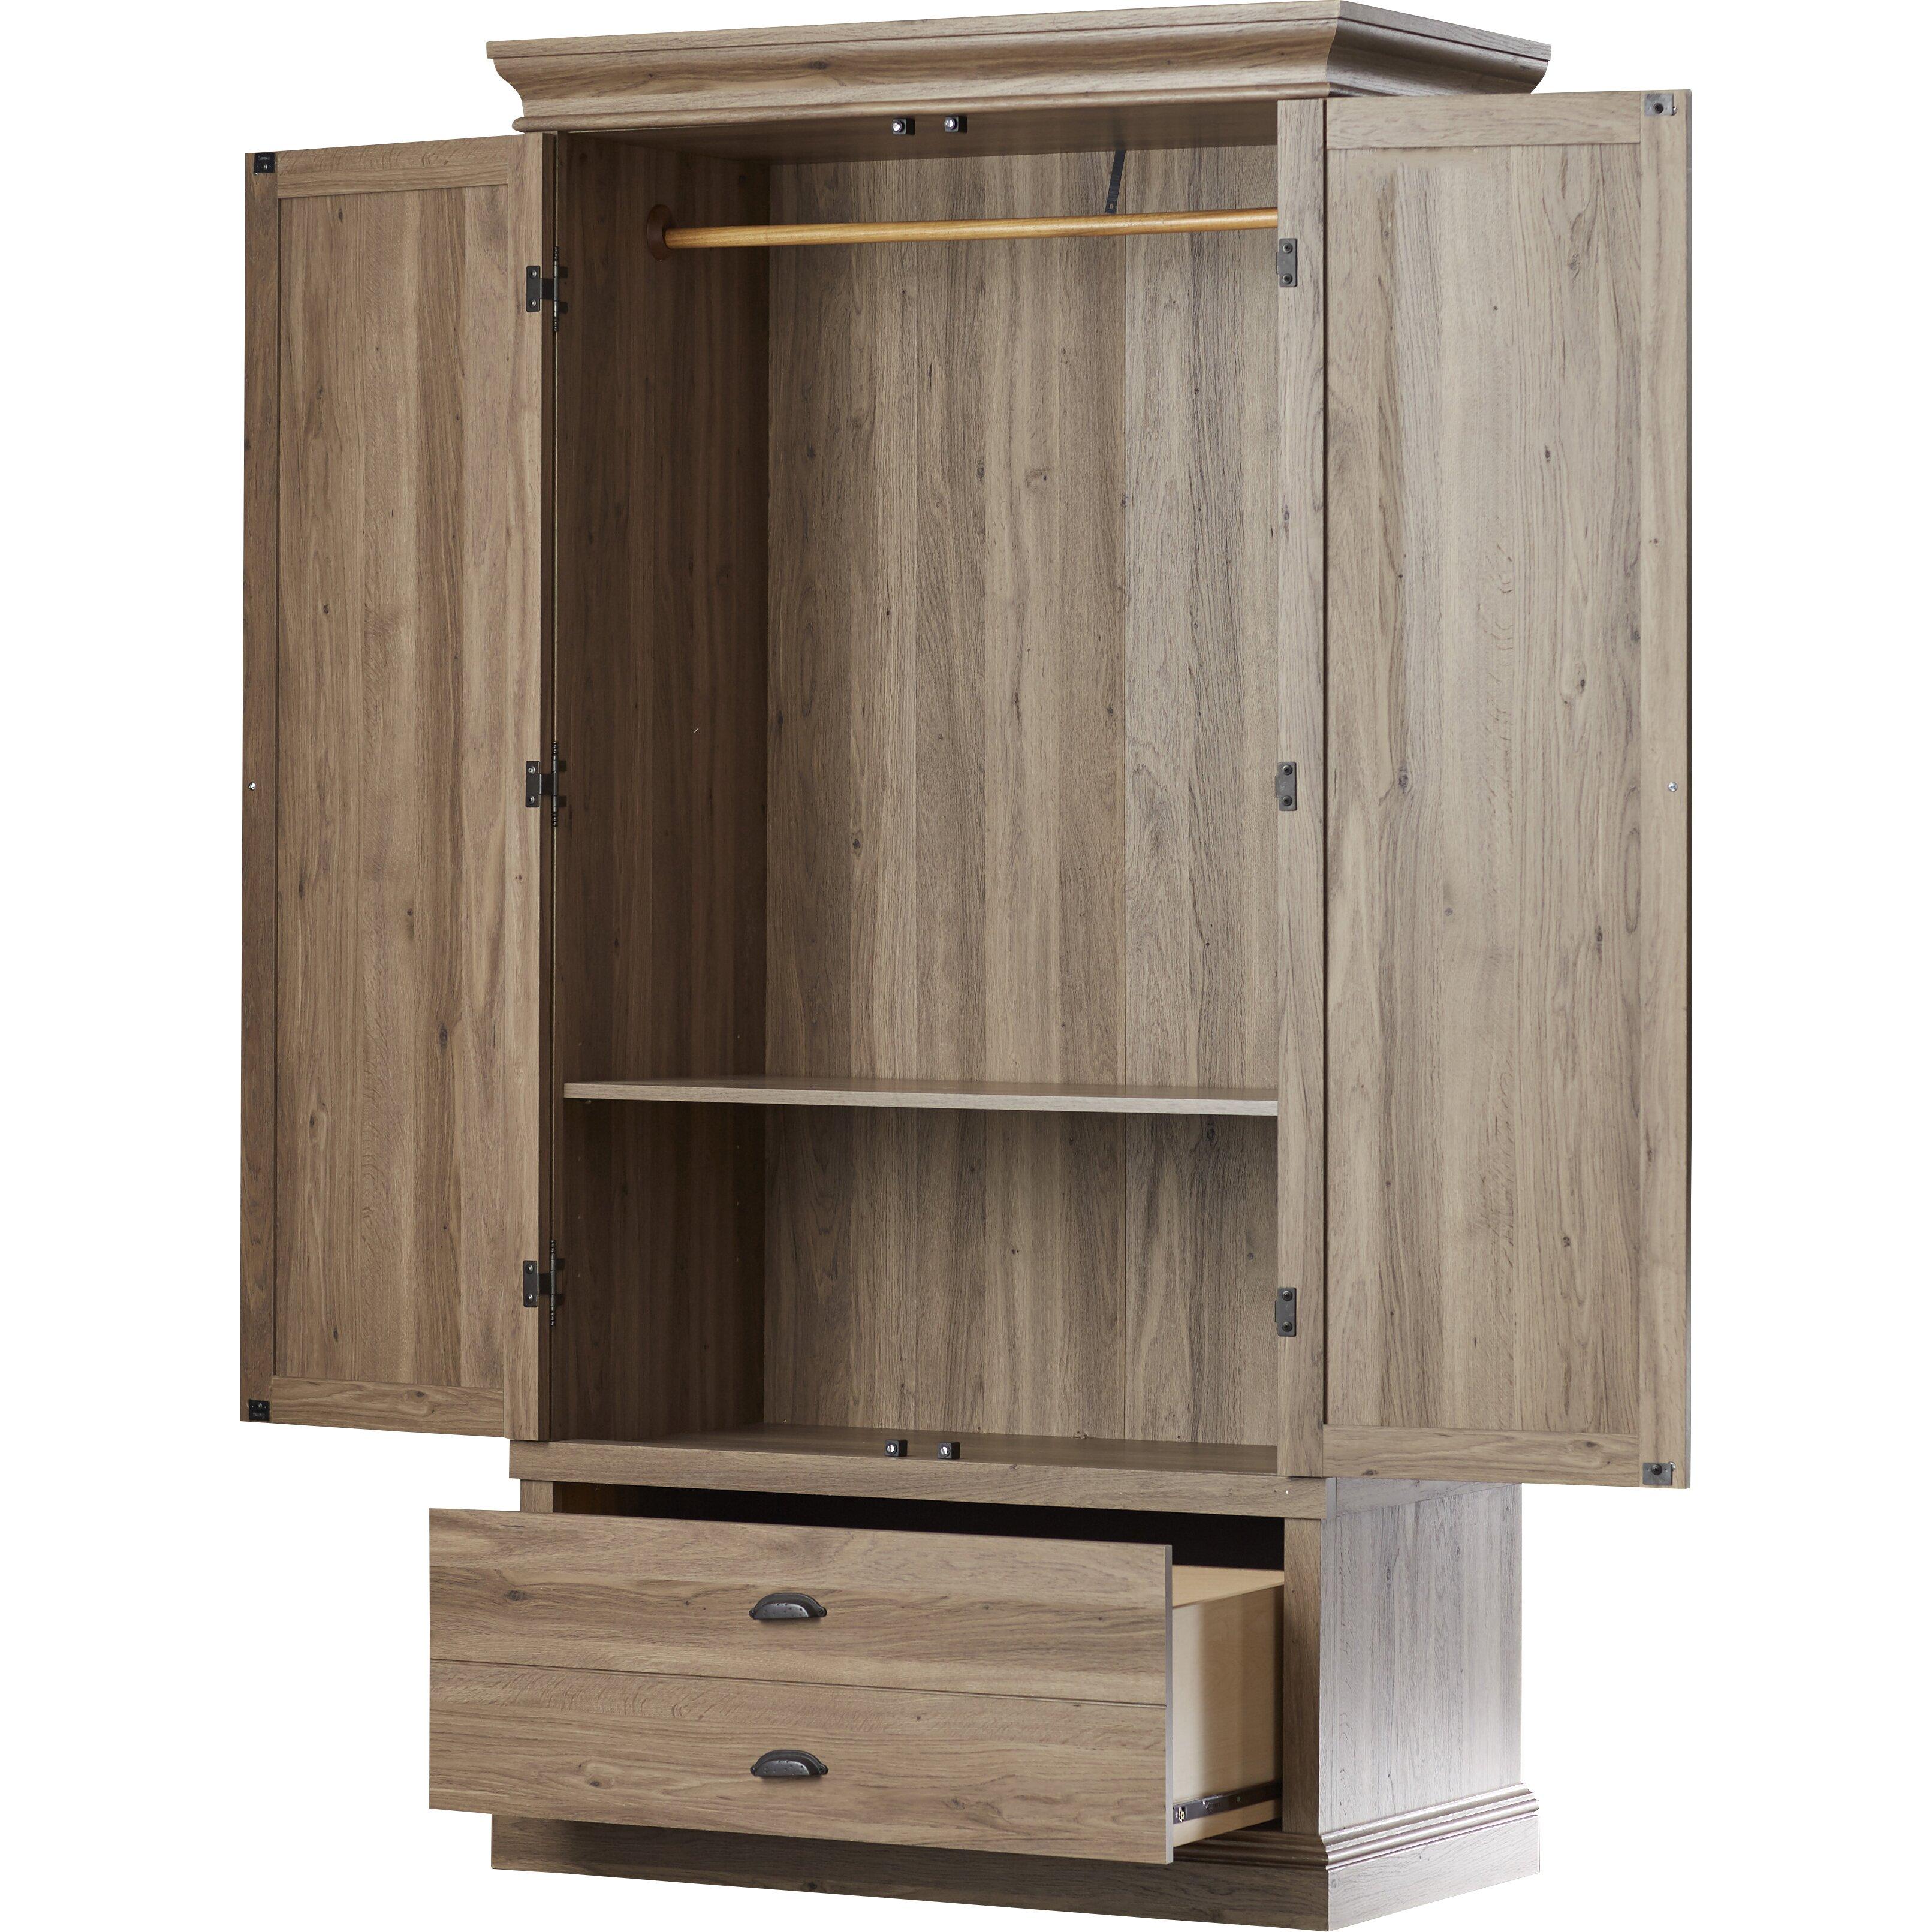 beachcrest home bowerbank bedroom armoire & reviews | wayfair